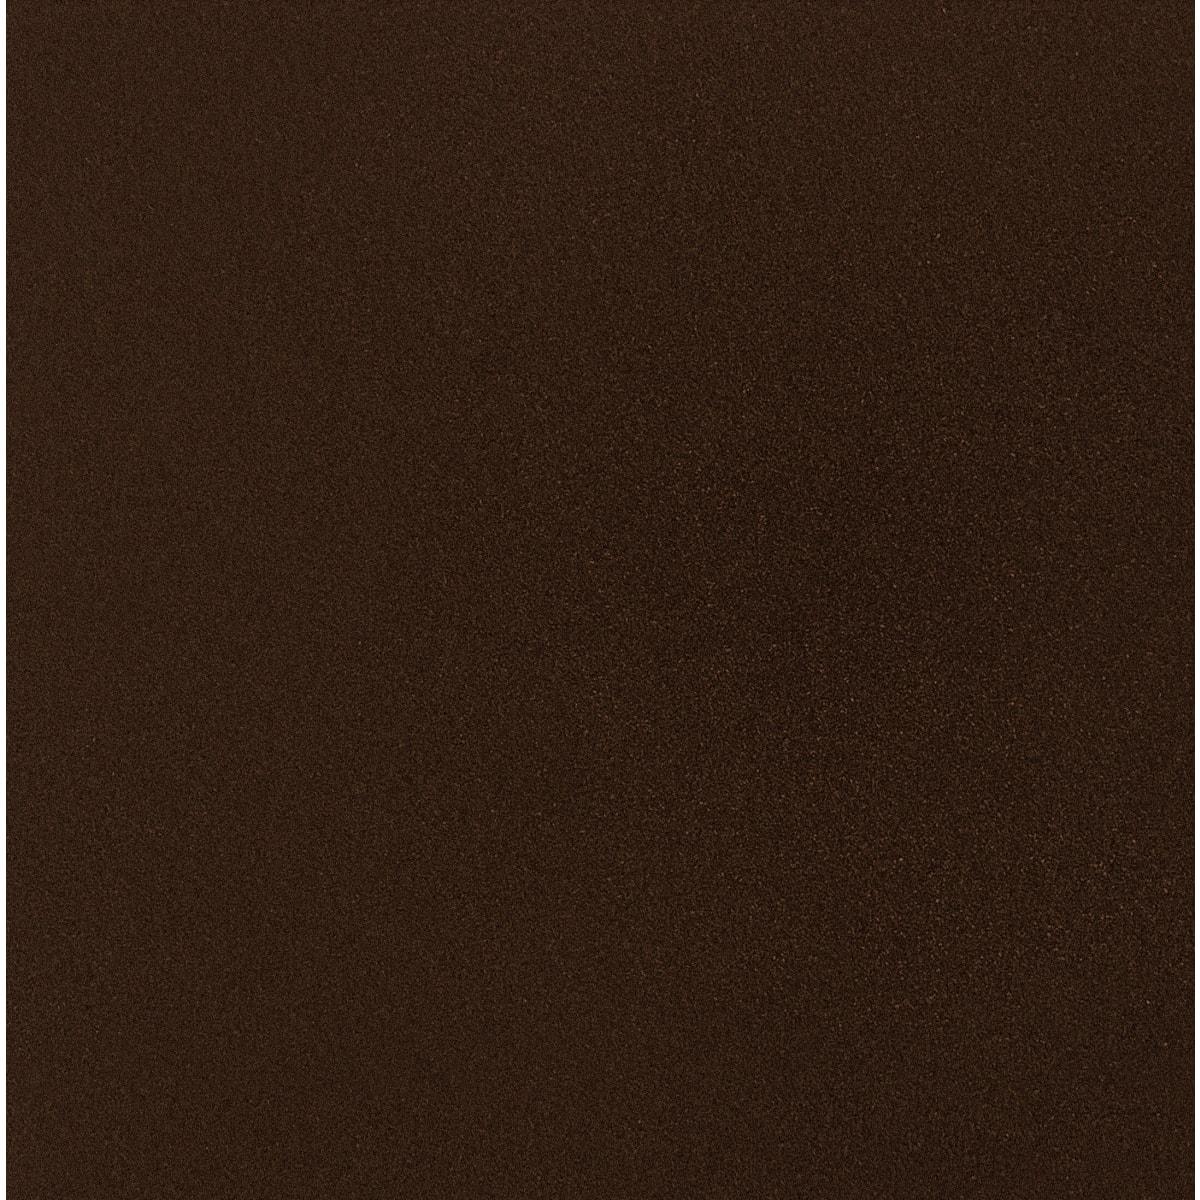 Плитка резиновая 500х500х16 коричневая